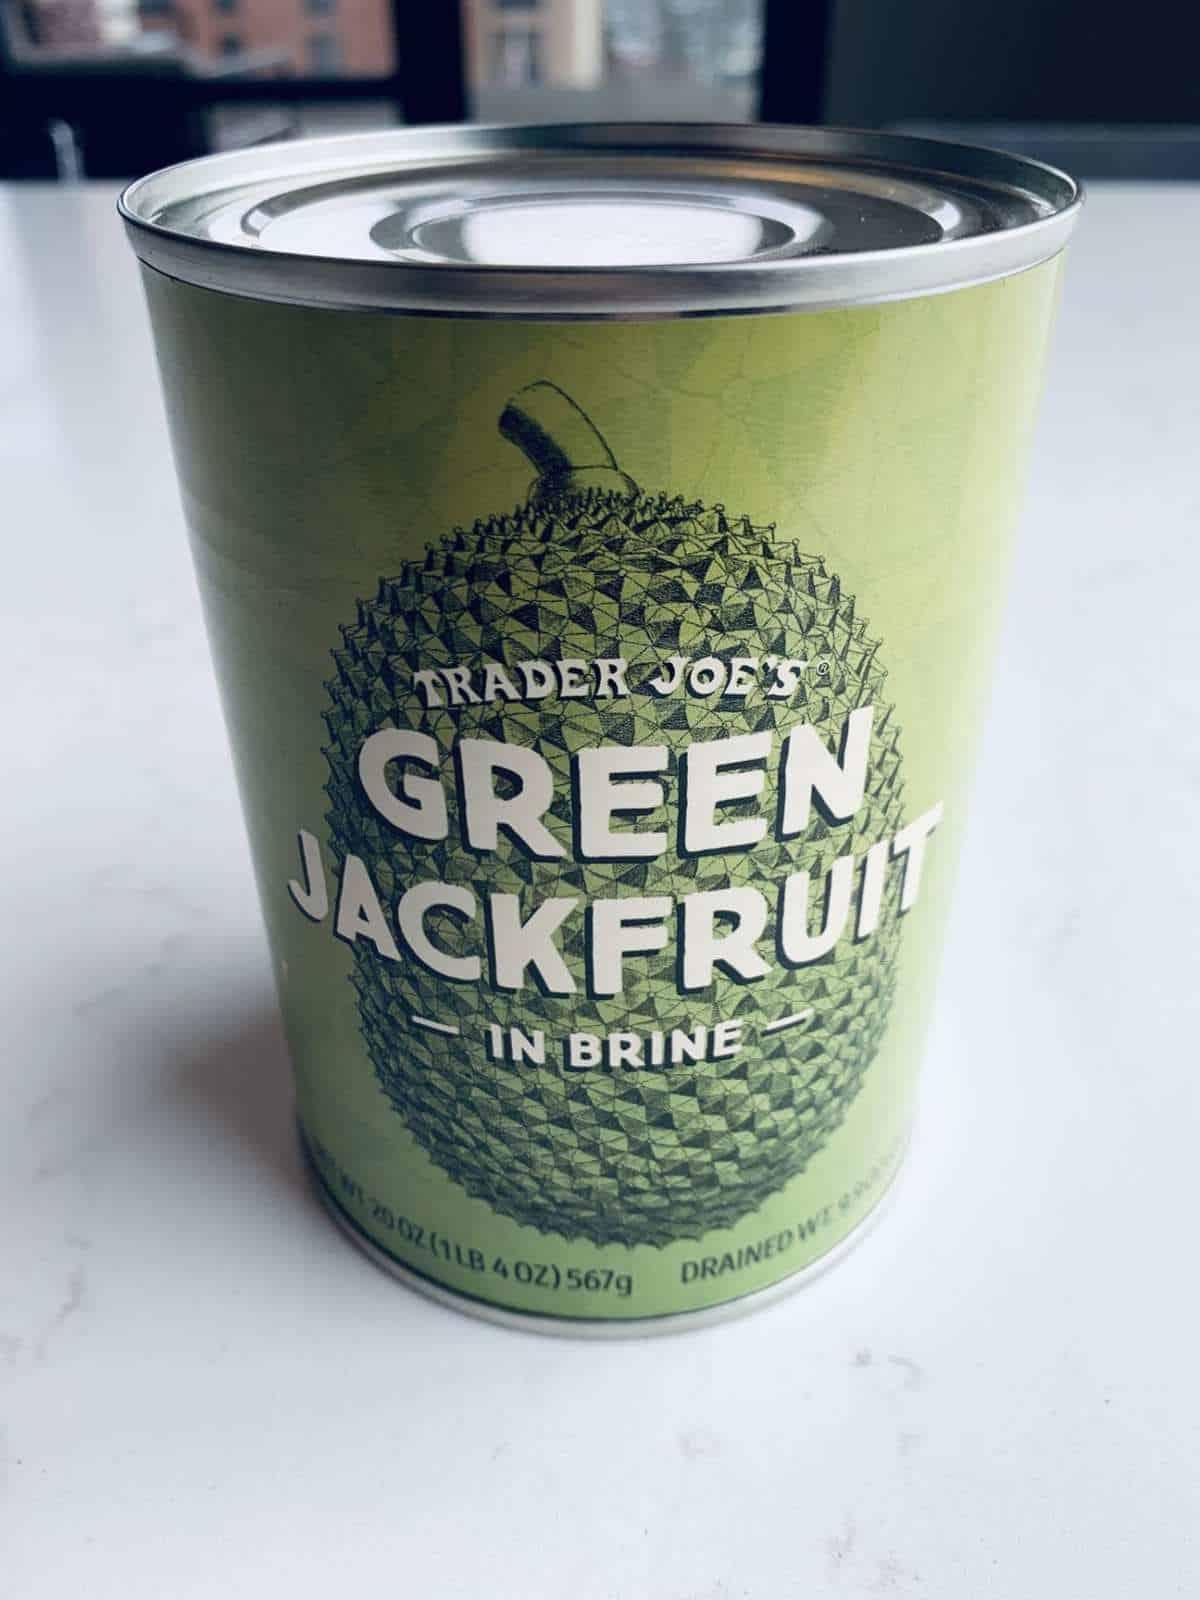 Traders Joe's Green Jackfruit